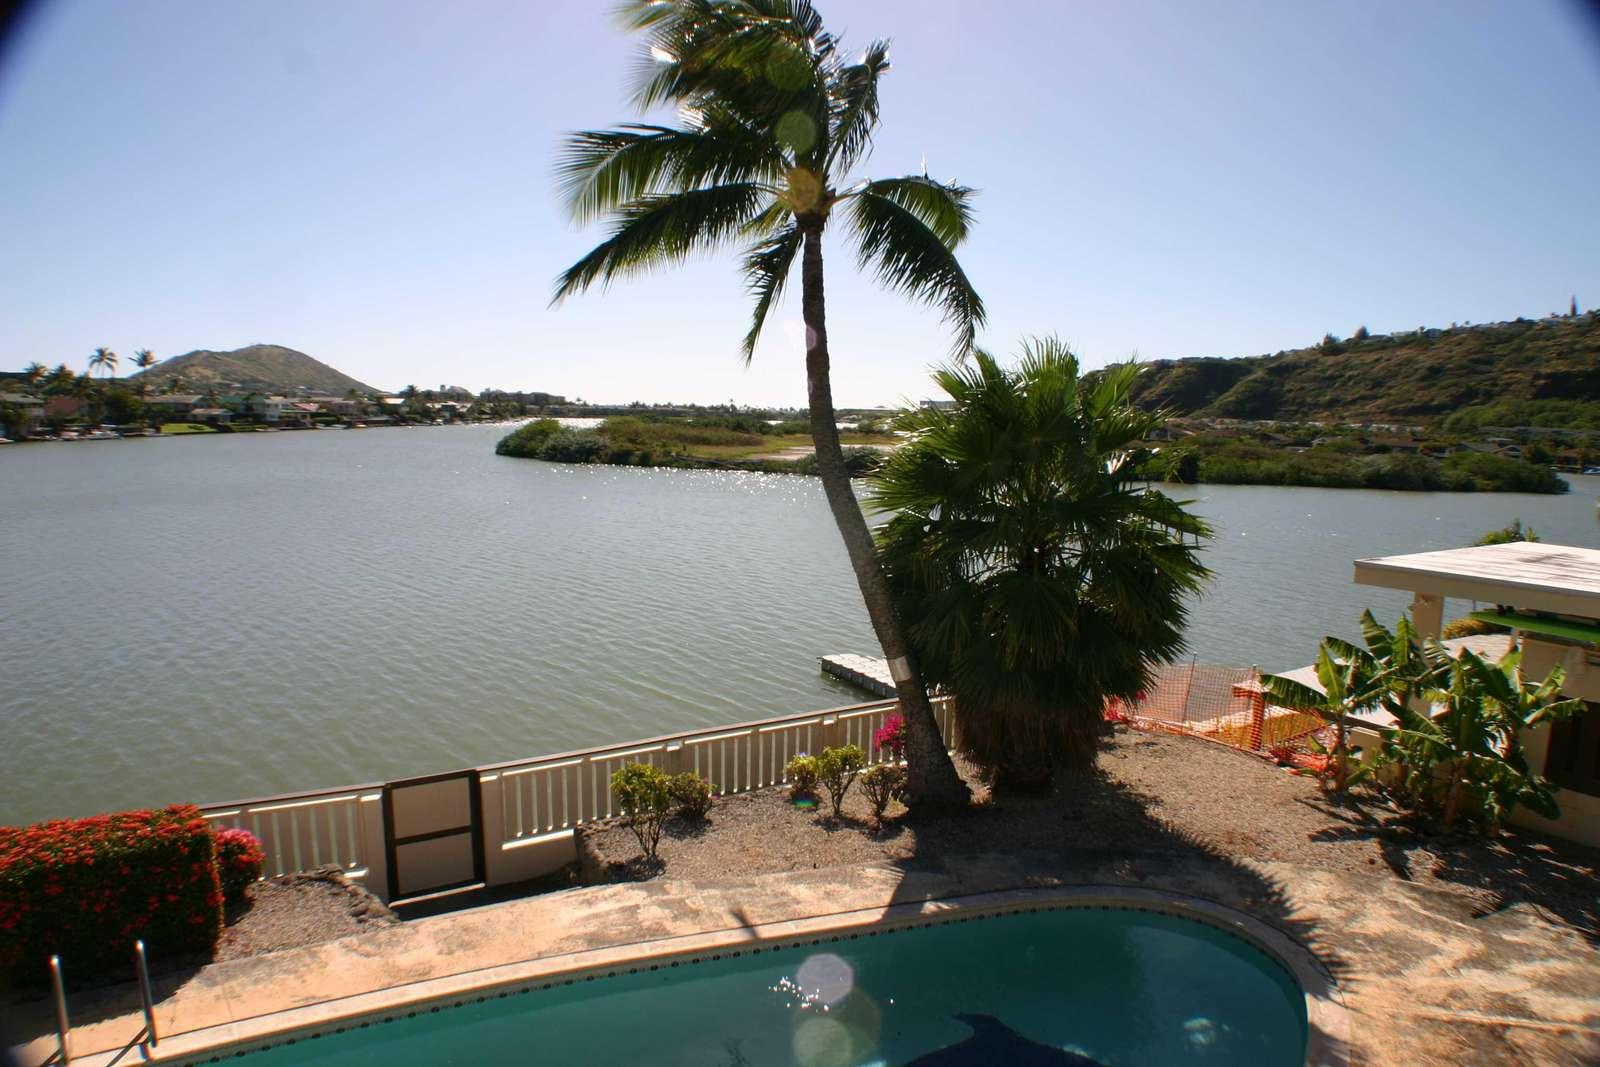 Mariners Cove Home With Stunning Koko Head Views Across The Marina